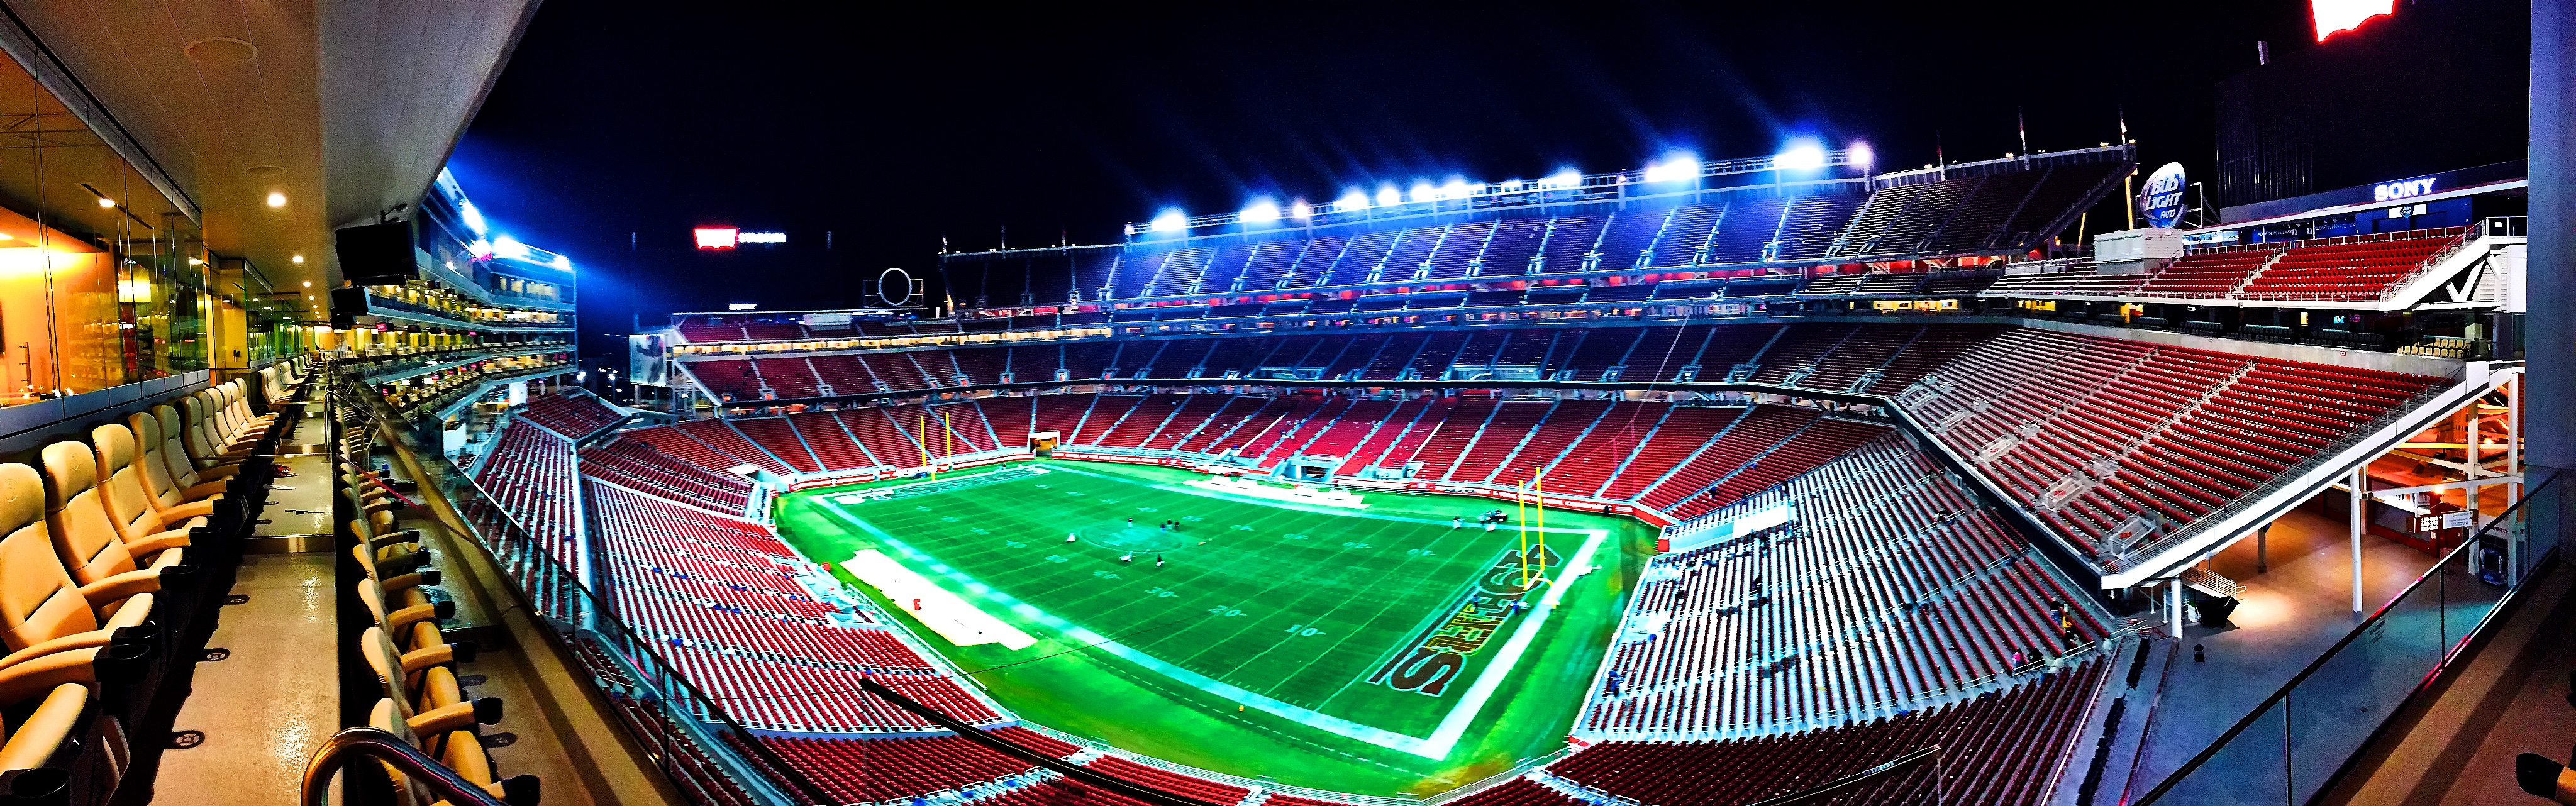 Football Stadium during Night